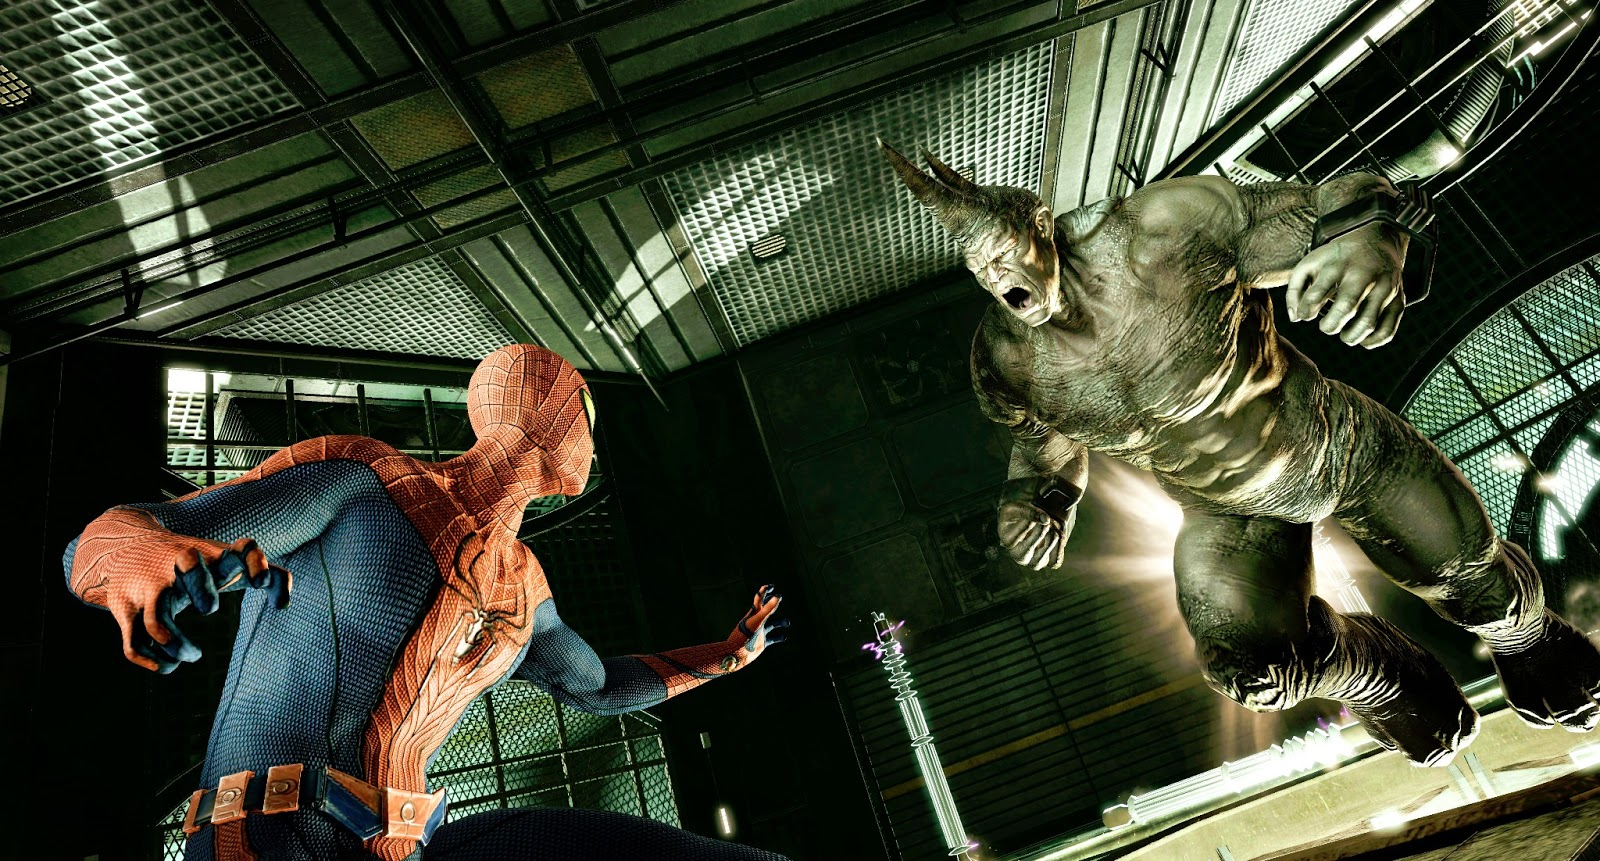 http://4.bp.blogspot.com/-pxBNGirSCSQ/UQcmGVSoCWI/AAAAAAAACiQ/YESiBqttGYE/s1600/2215362-amazing_spider_man_rhino_and_spider_man.jpg